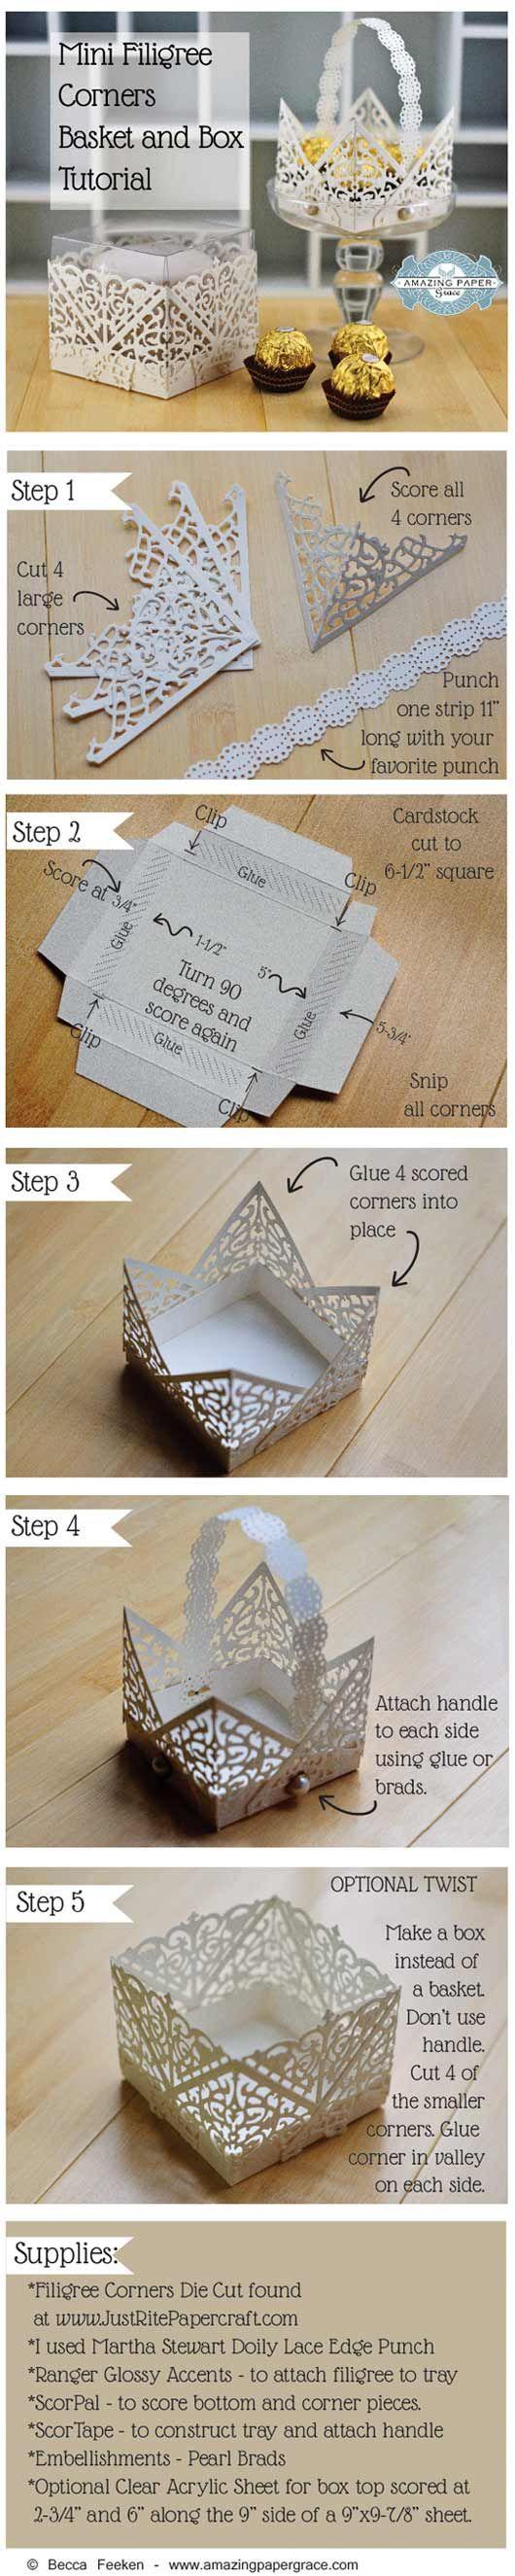 Mini Filigree Corners Basket Tutorial and Mini Filigree Corners Box Tutorial by Becca Feeken